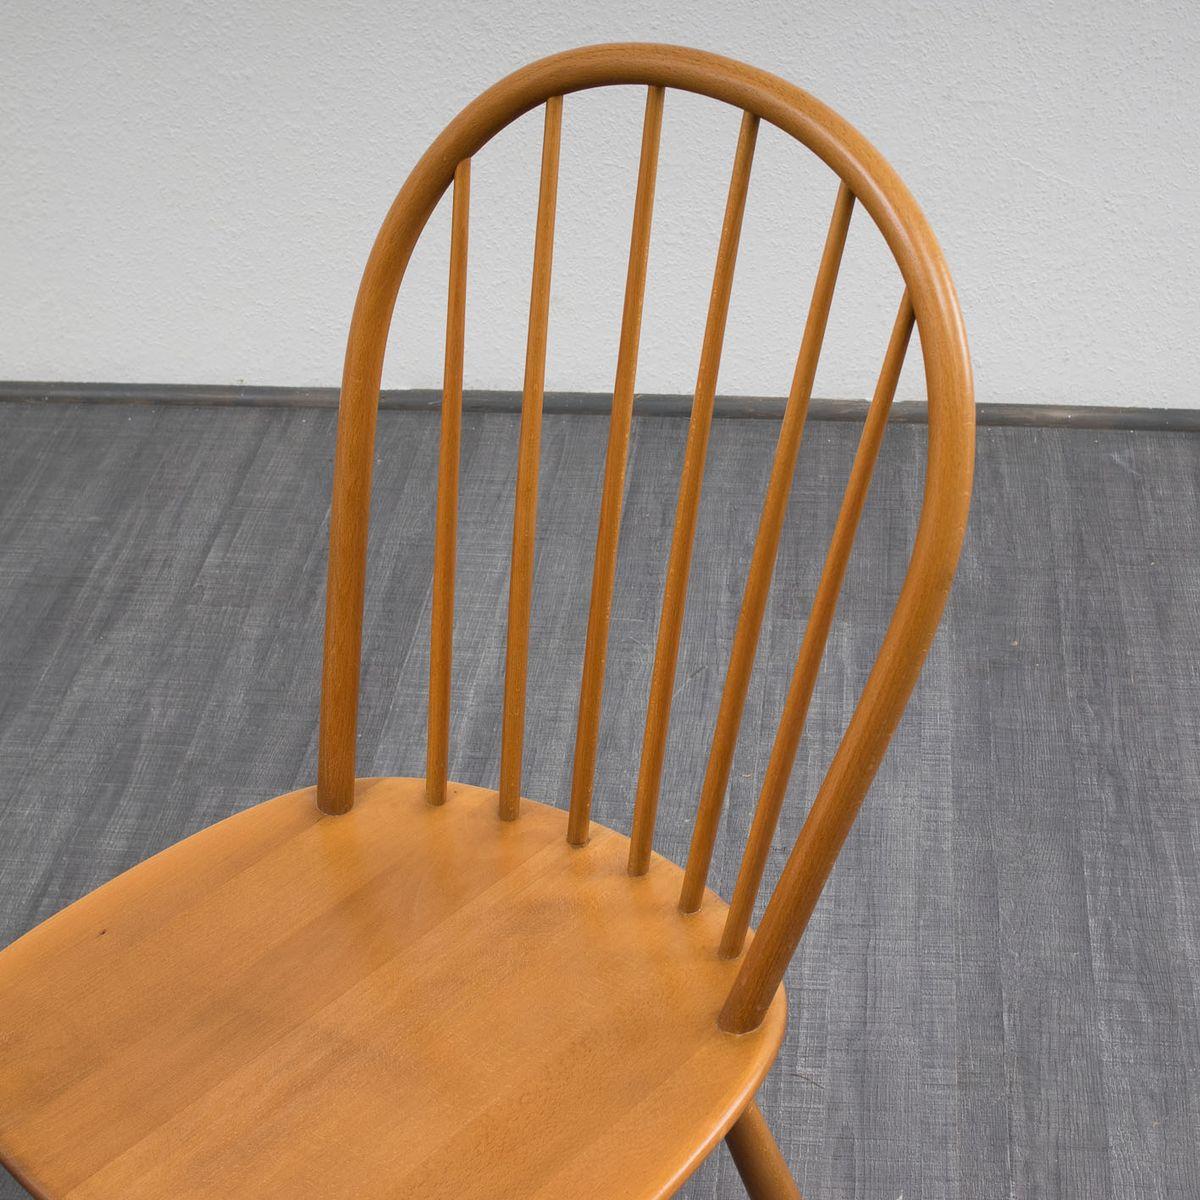 vintage buchenholz esszimmerst hle 4er set bei pamono kaufen. Black Bedroom Furniture Sets. Home Design Ideas